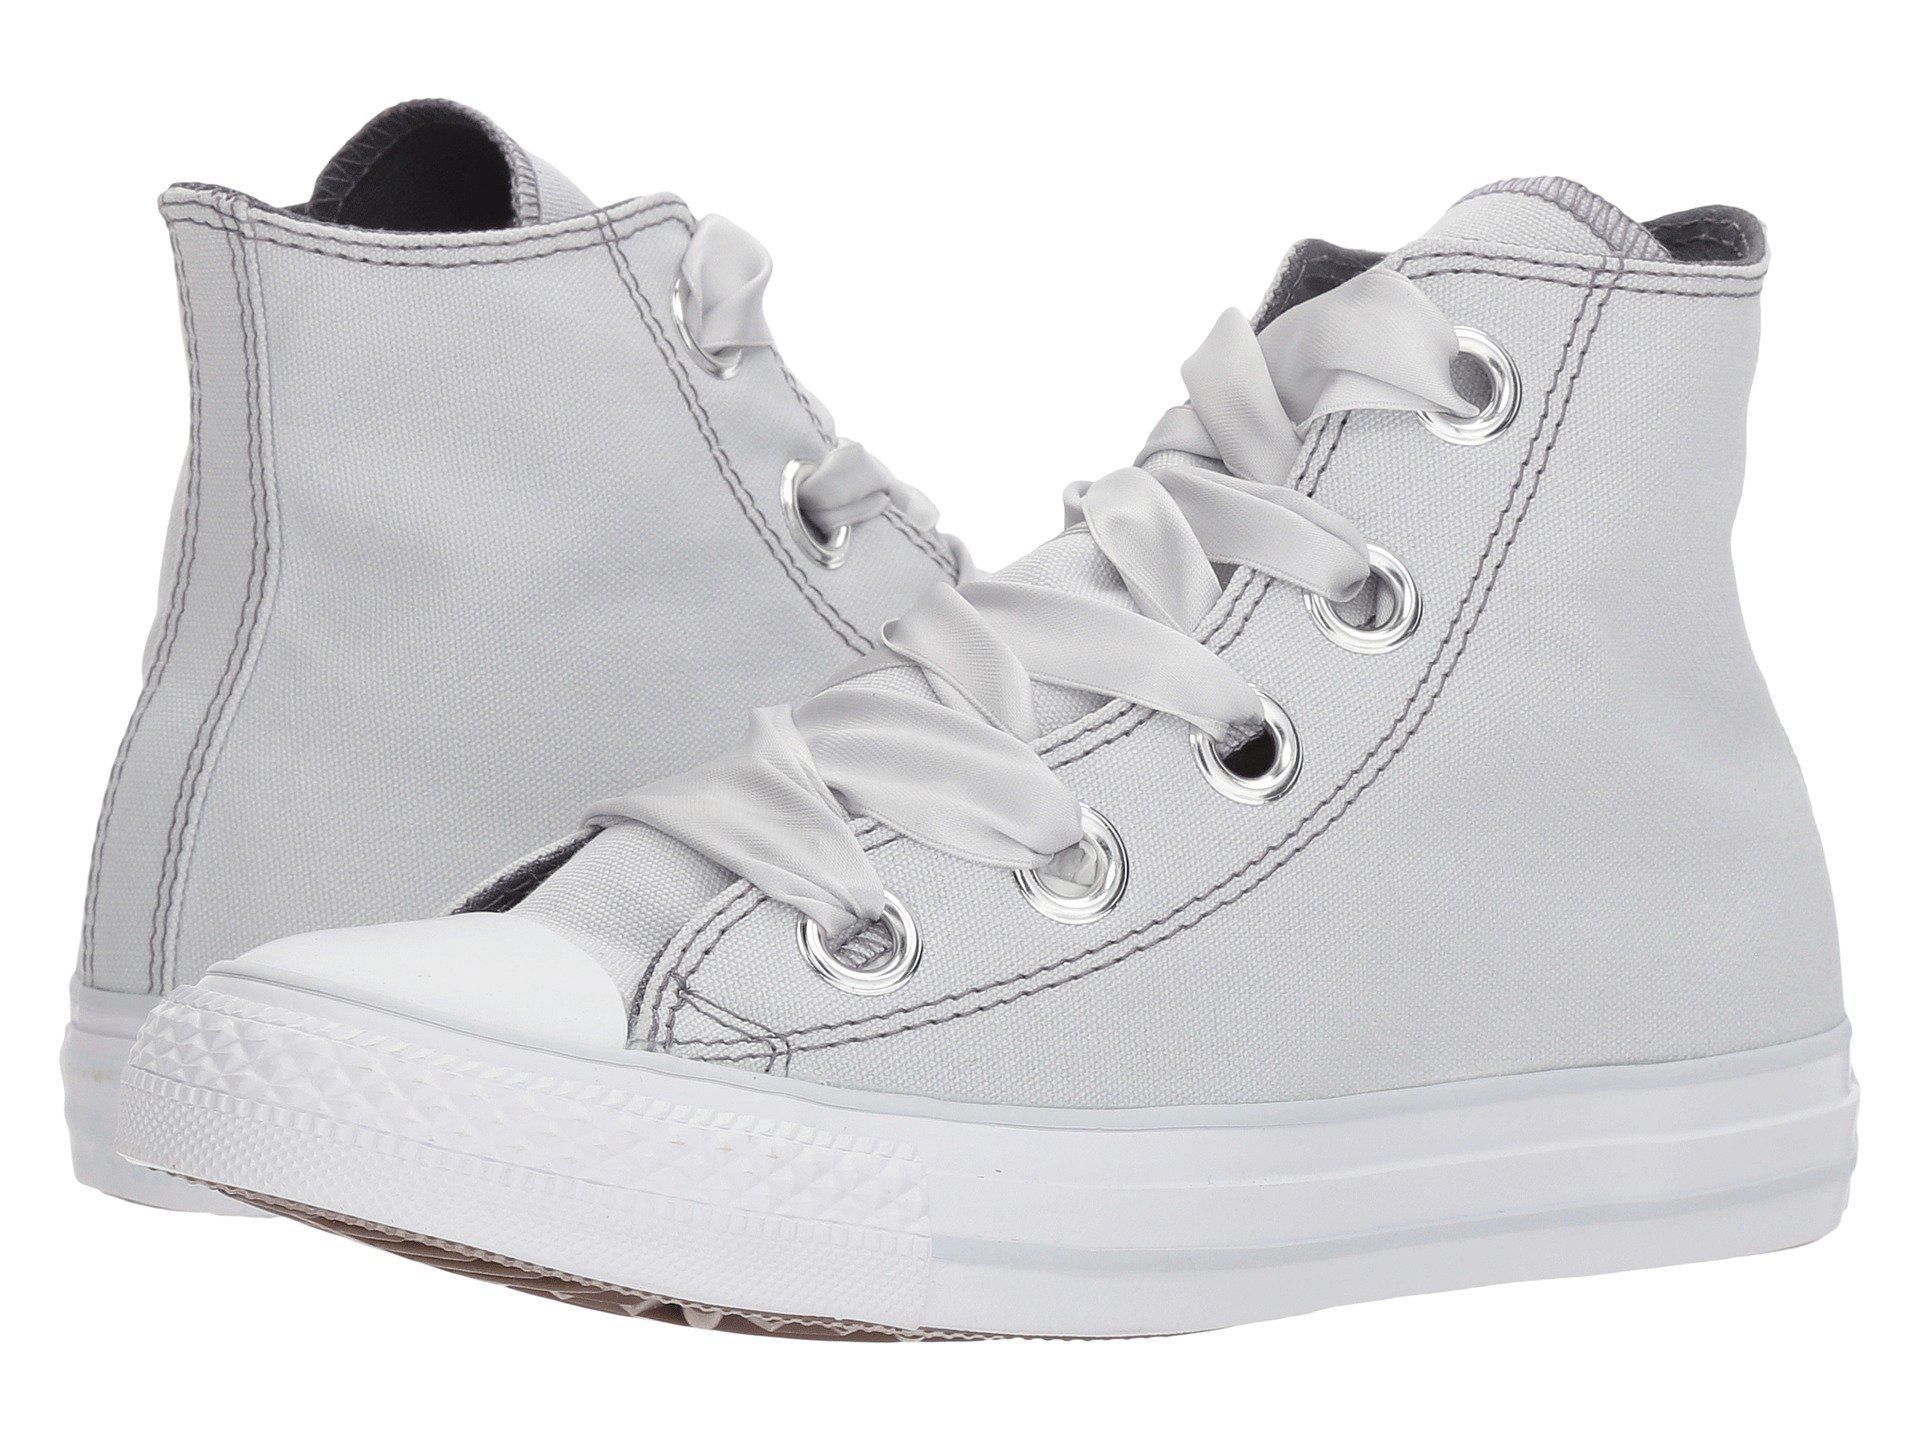 126f844ac89e Lyst - Converse Chuck Taylor® All Star Pastel Canvas Big Eyelet Hi ...